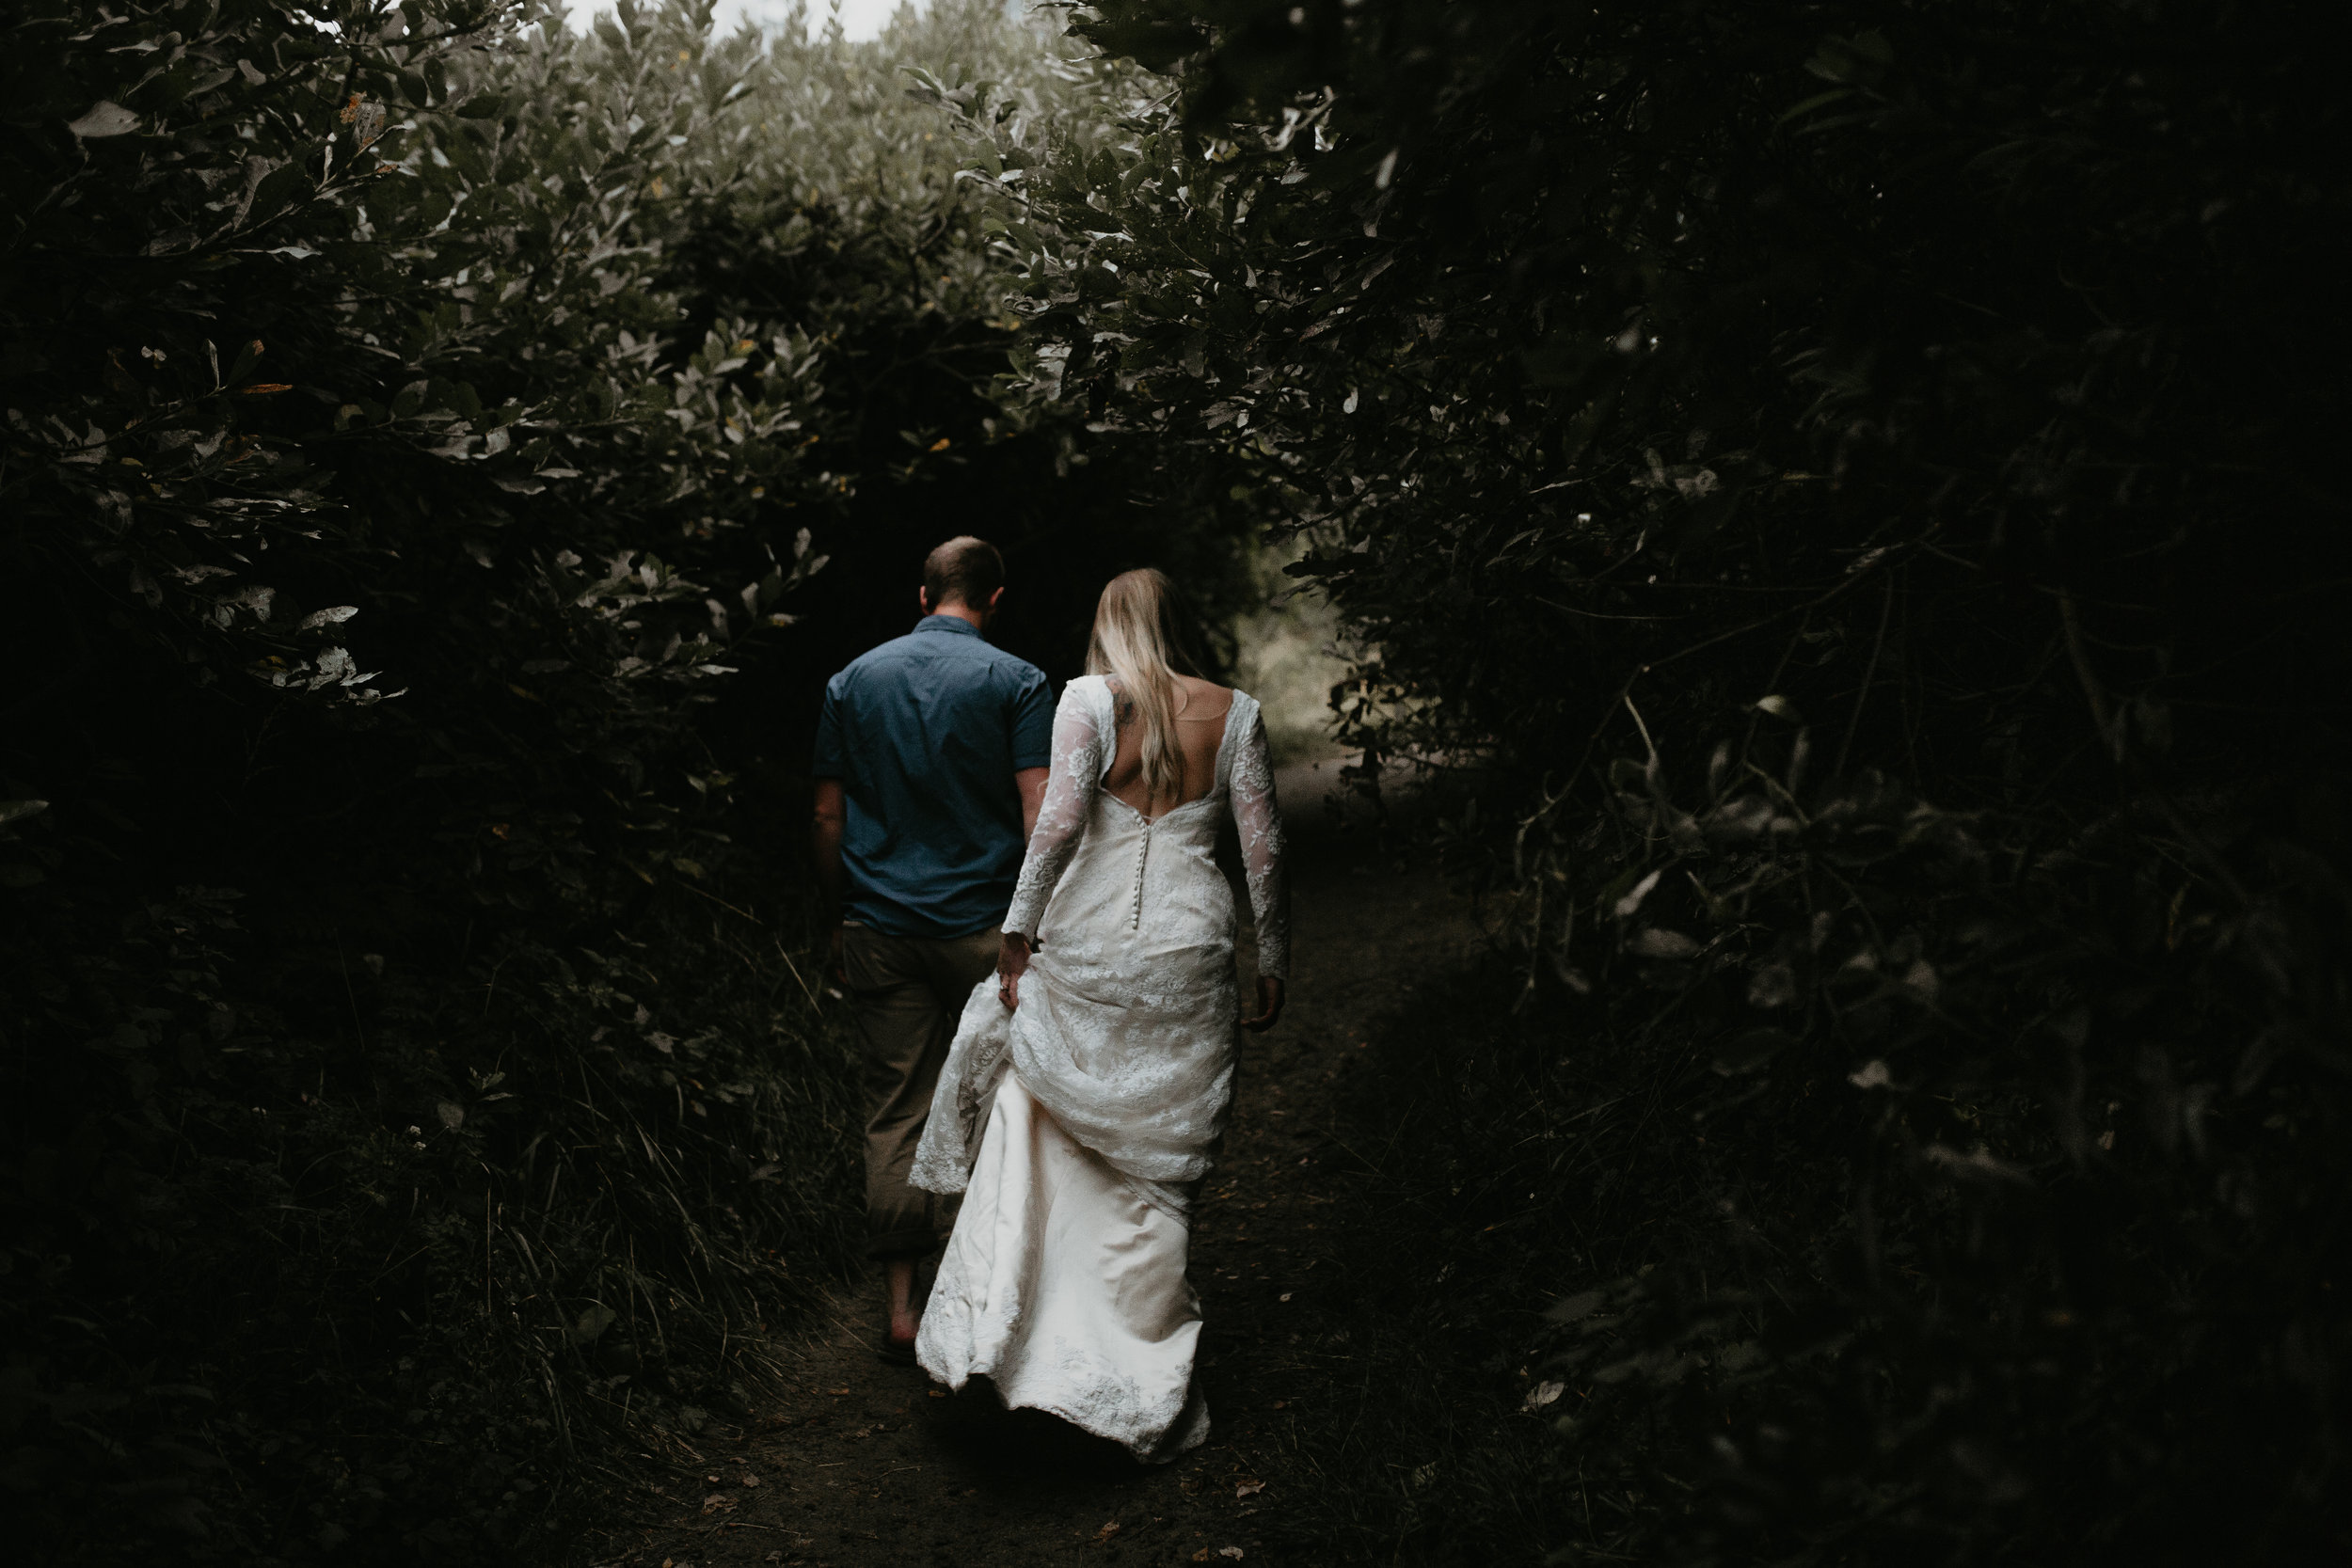 nicole-daacke-photography-ecola-state-park-oregon-elopement-bridal-photos-photographer-for-cannon-beach-elopement-oregon-coast-elopement-photographer-foggy-summer-elopement-cannon-beach-best-adventure-elopement-photographer-7167.jpg